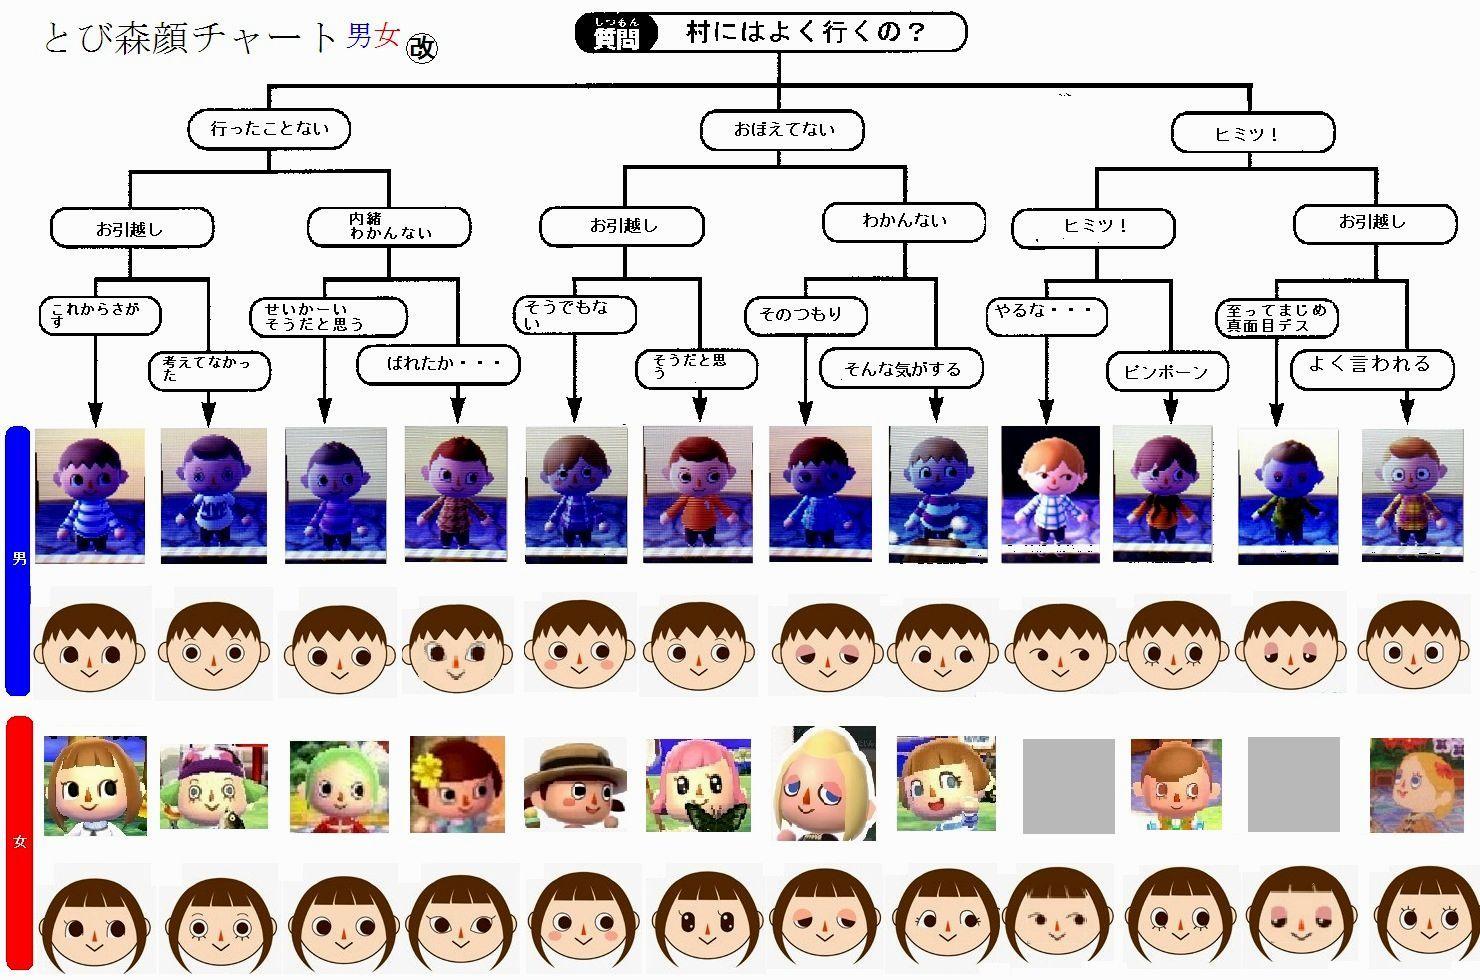 Boys Hairstyles Acnl New Leaf Hair Guide Acnl Hair Guide Animal Crossing Hair Guide